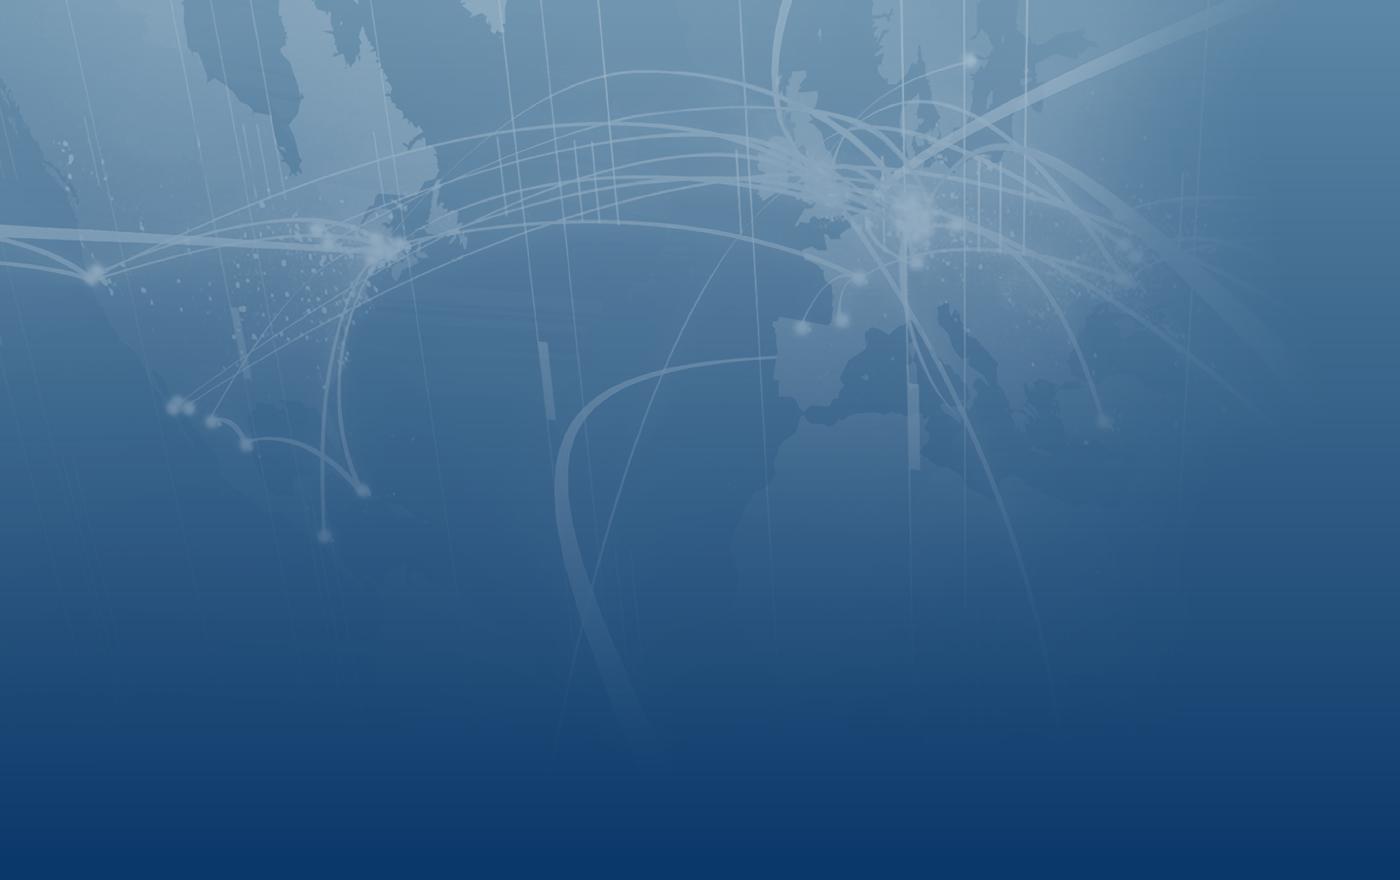 Website Backgrounds Website Login Page Background 1400x880 Download Hd Wallpaper Wallpapertip